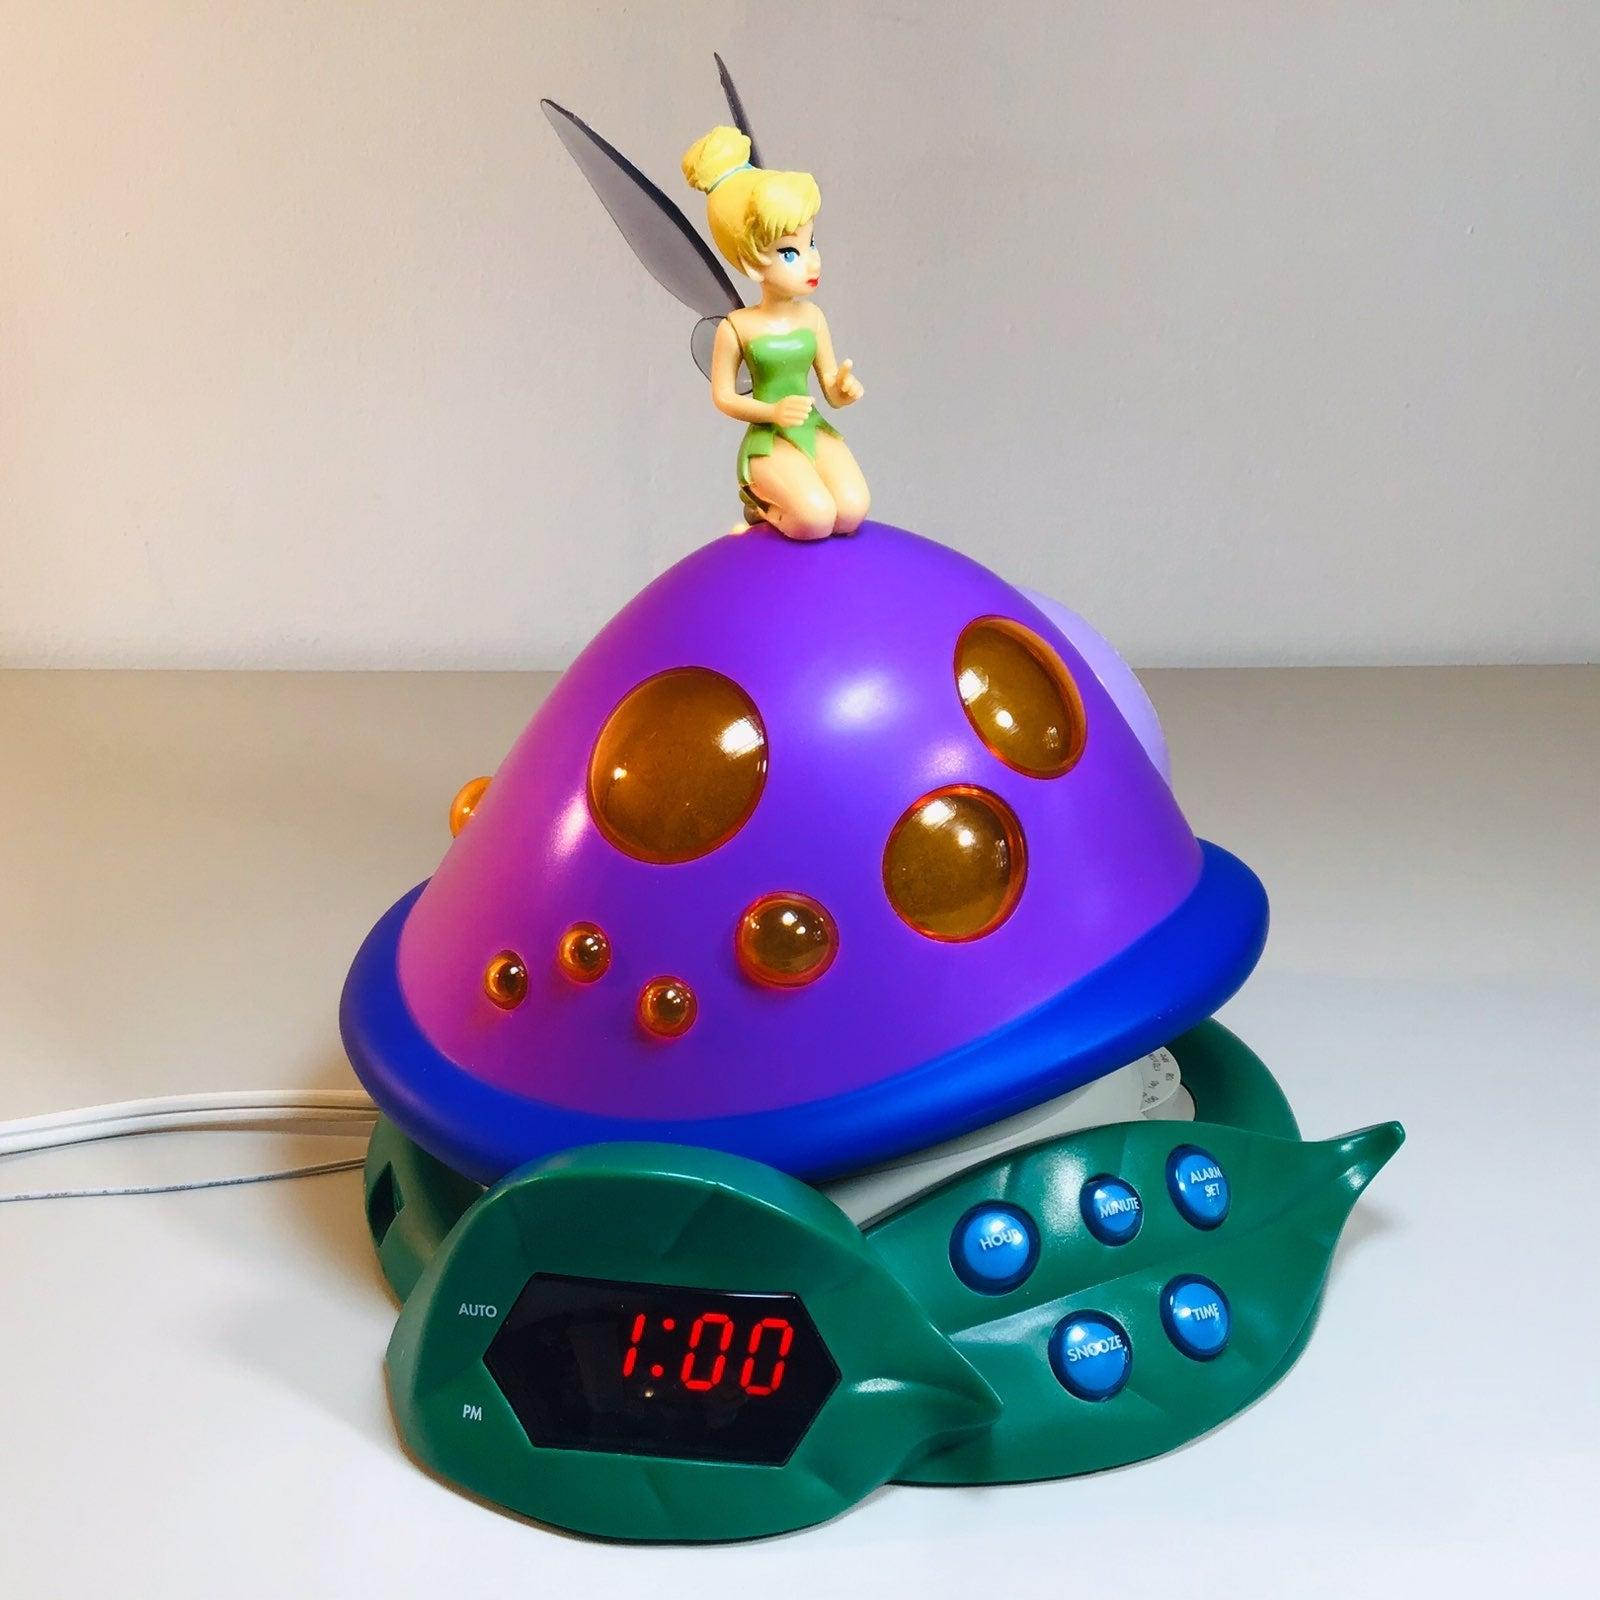 Disney TinkerBell alarm clock